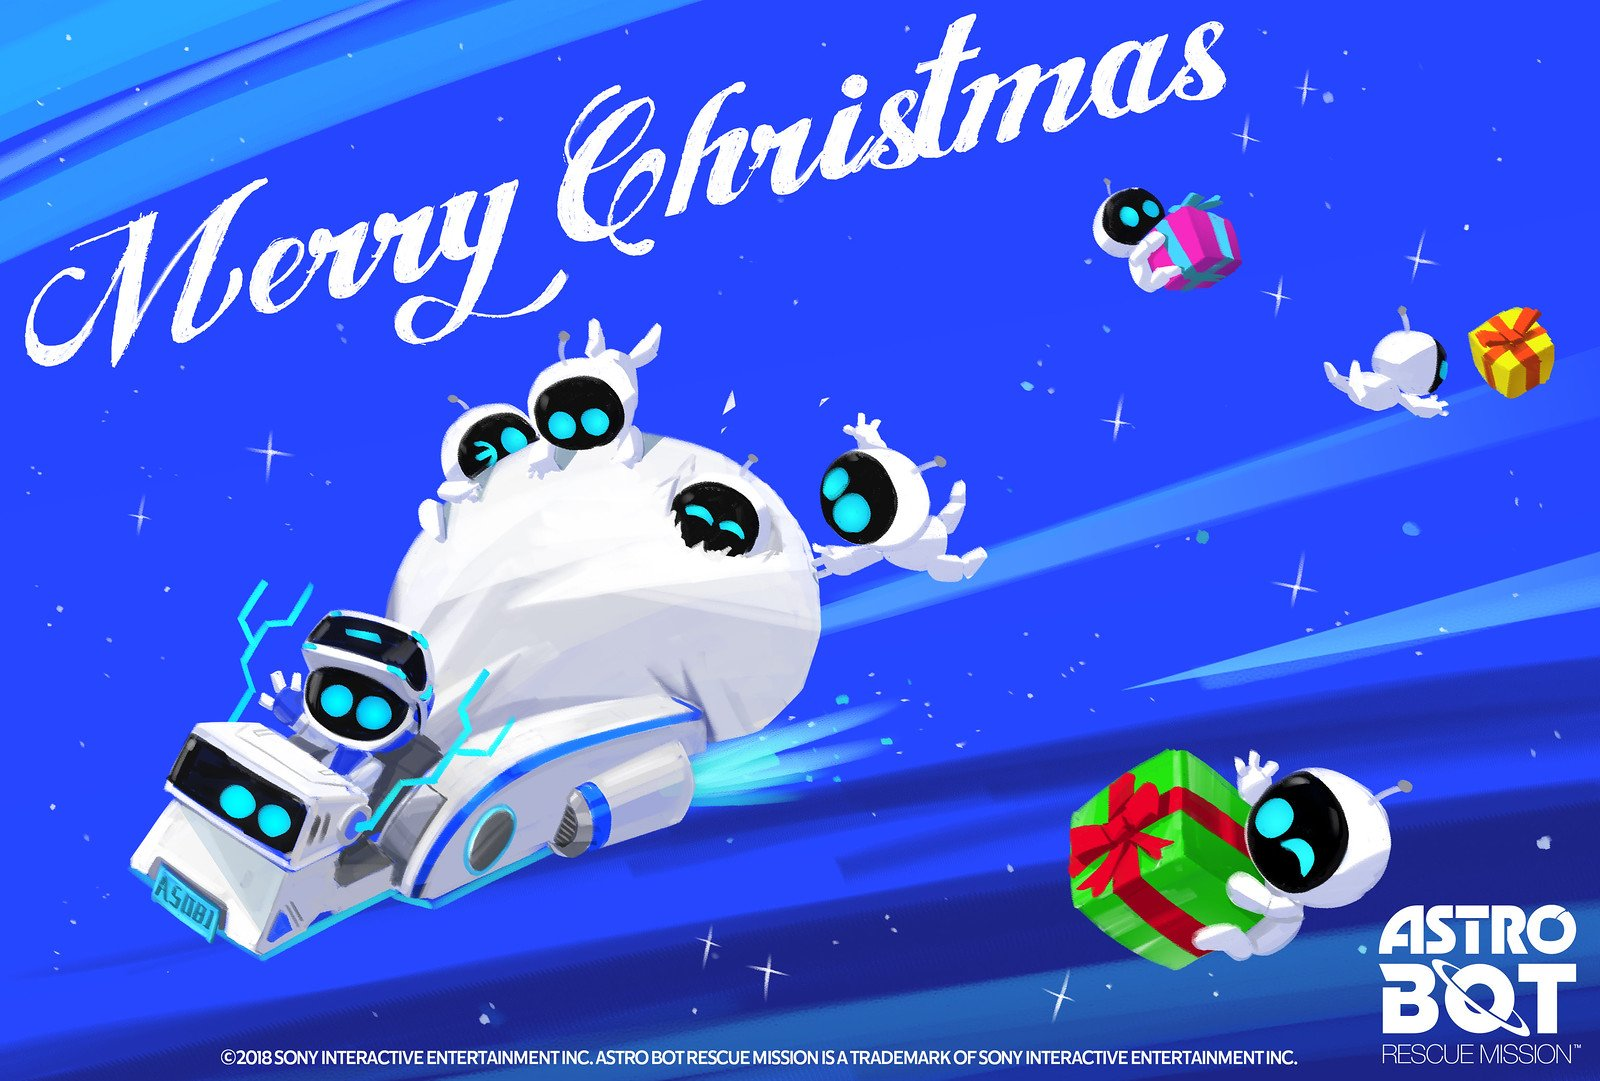 Astro Bot Happy Holidays Wallpaper